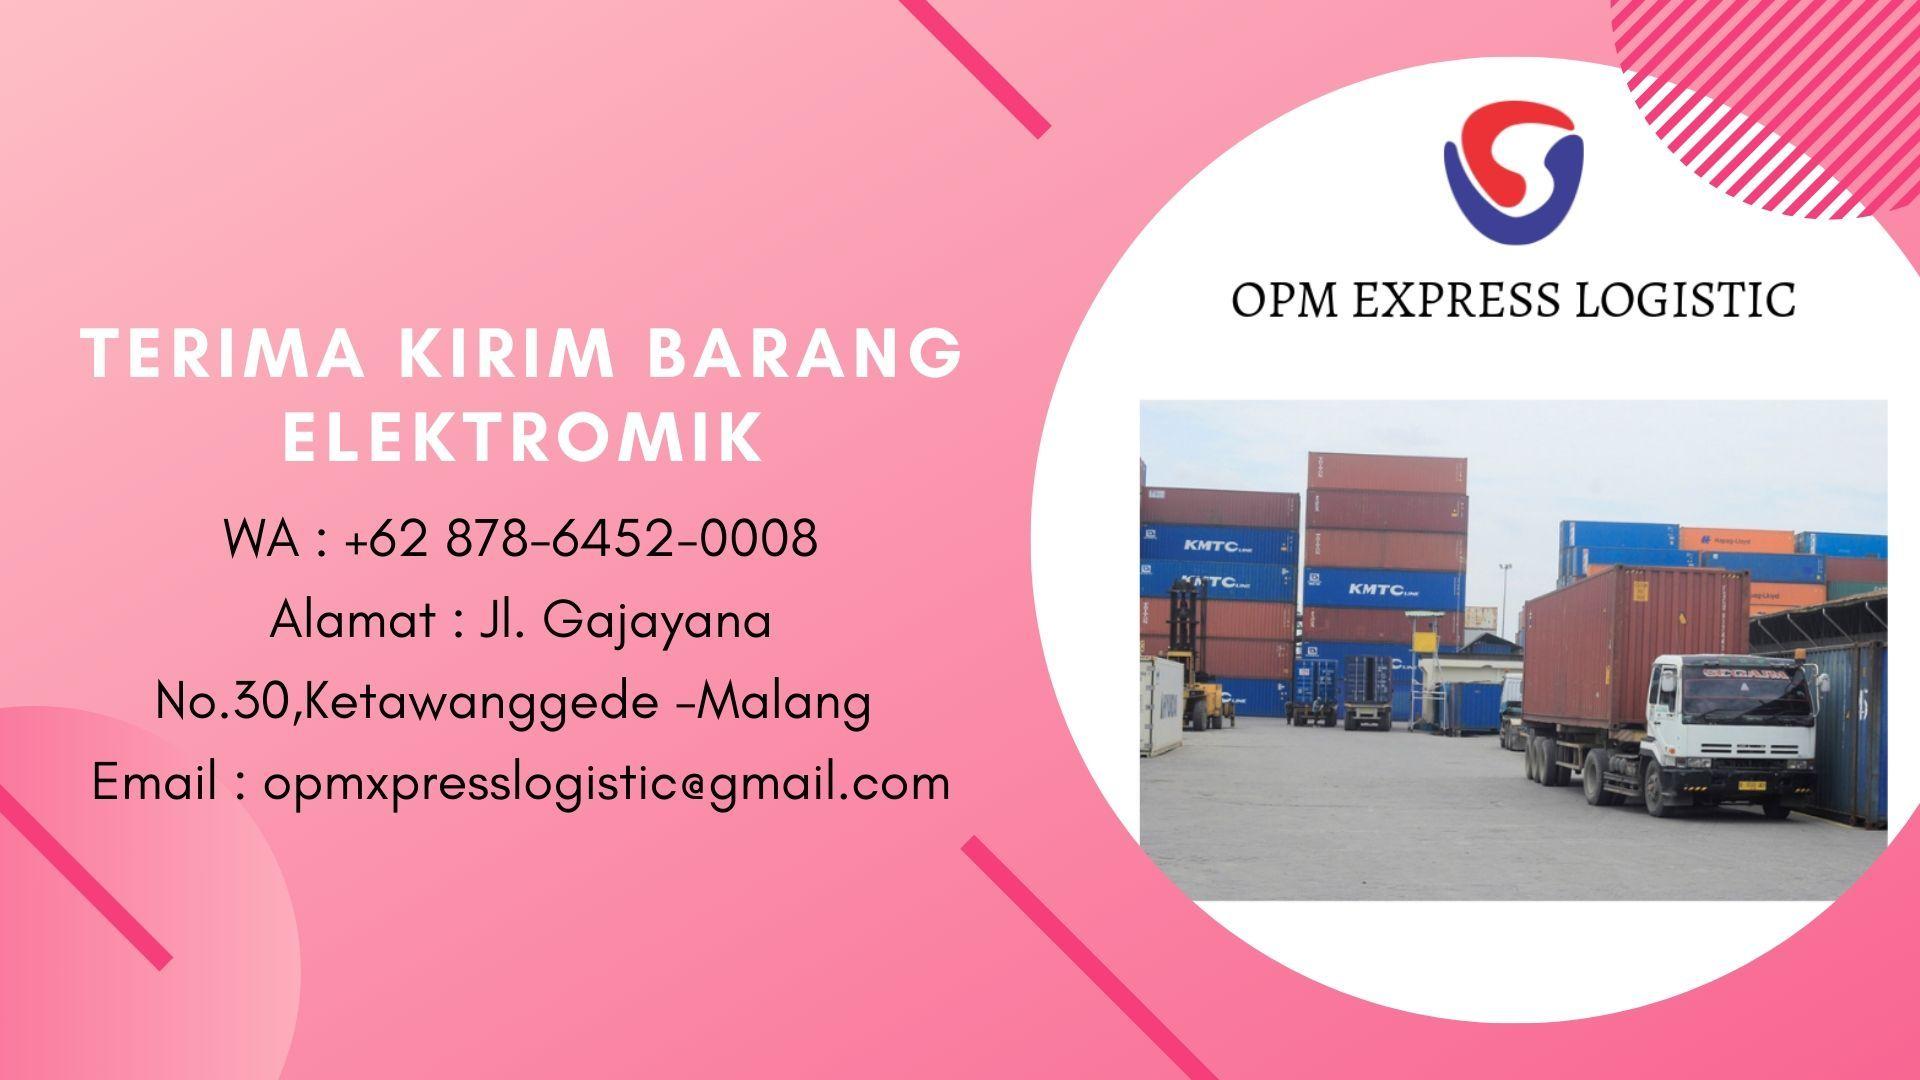 Terima Kirim Barang Elektronik Wa 62 878 6452 0008 Opm Express Logistic